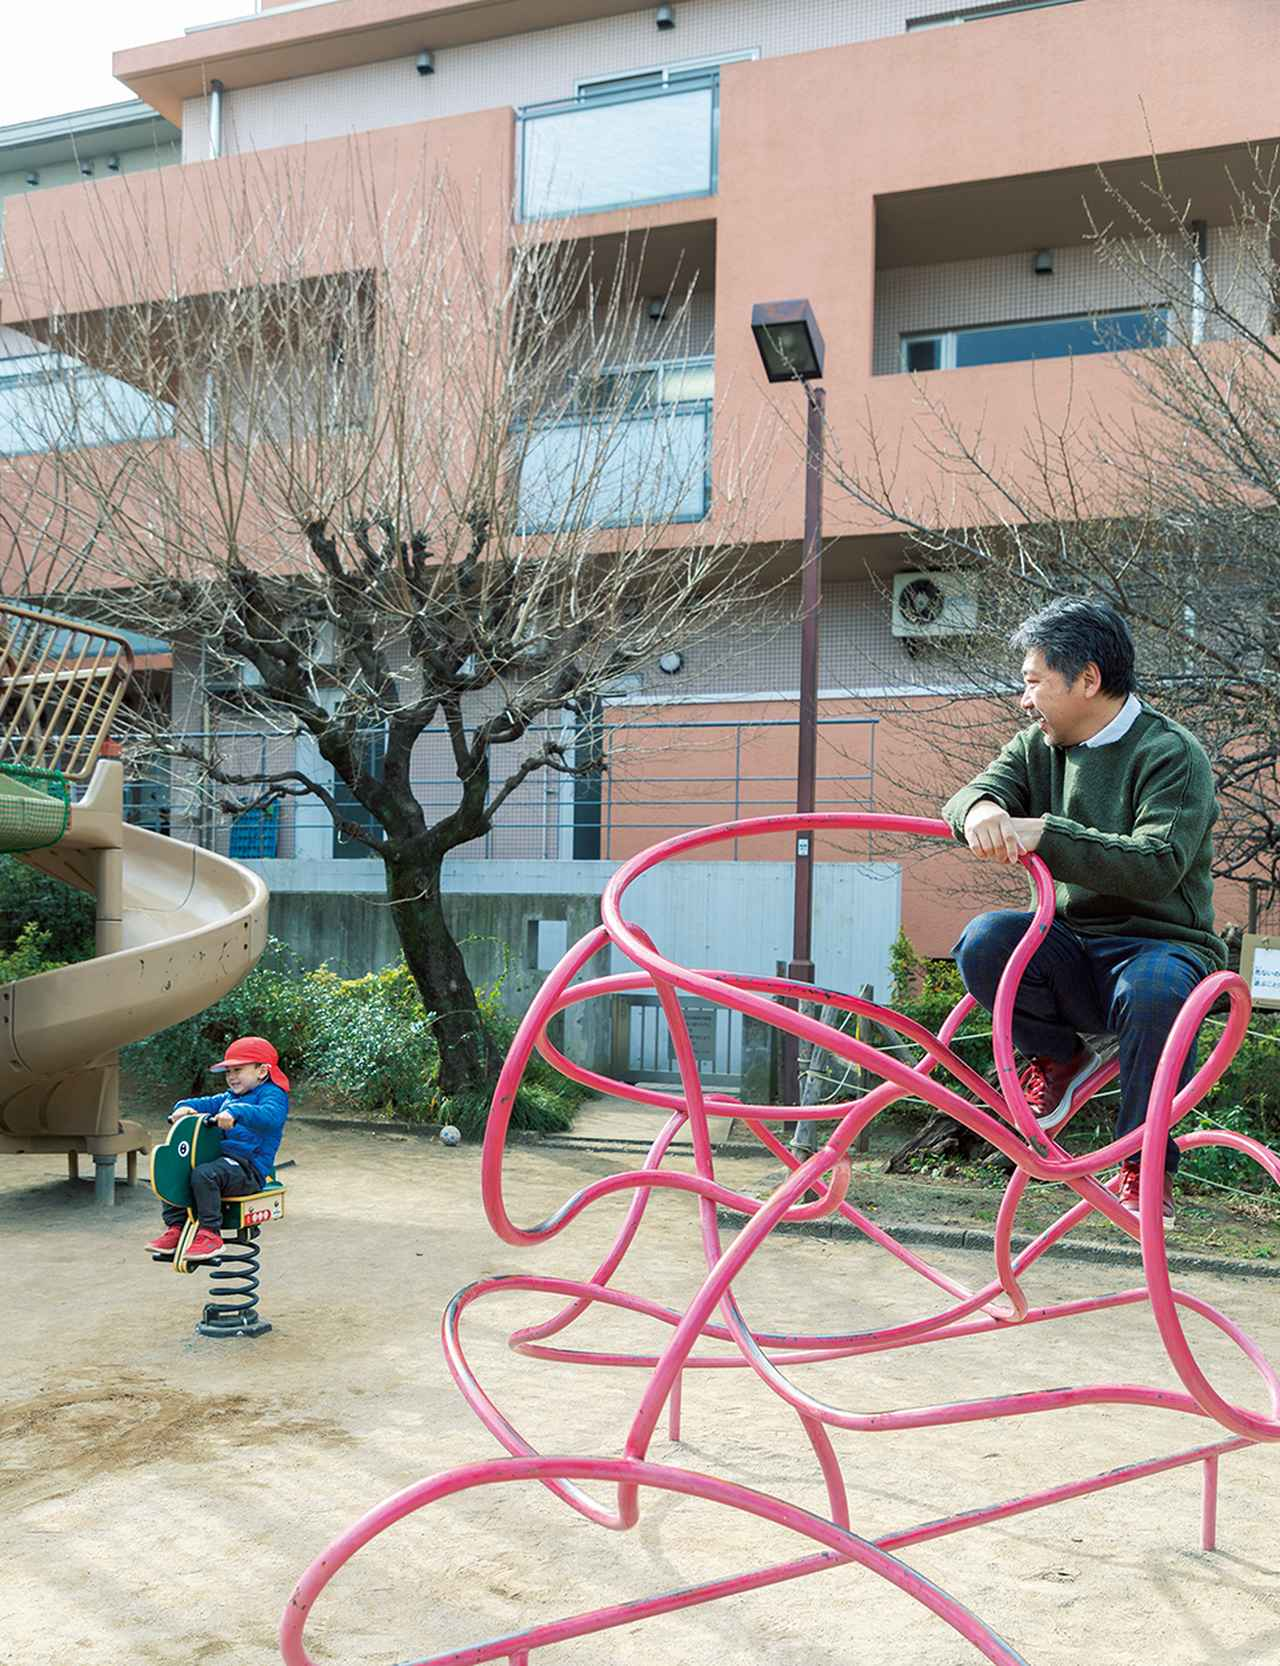 Images : 11番目の画像 - 「見えざる人々を見る。 映画監督・是枝裕和インタビュー」のアルバム - T JAPAN:The New York Times Style Magazine 公式サイト